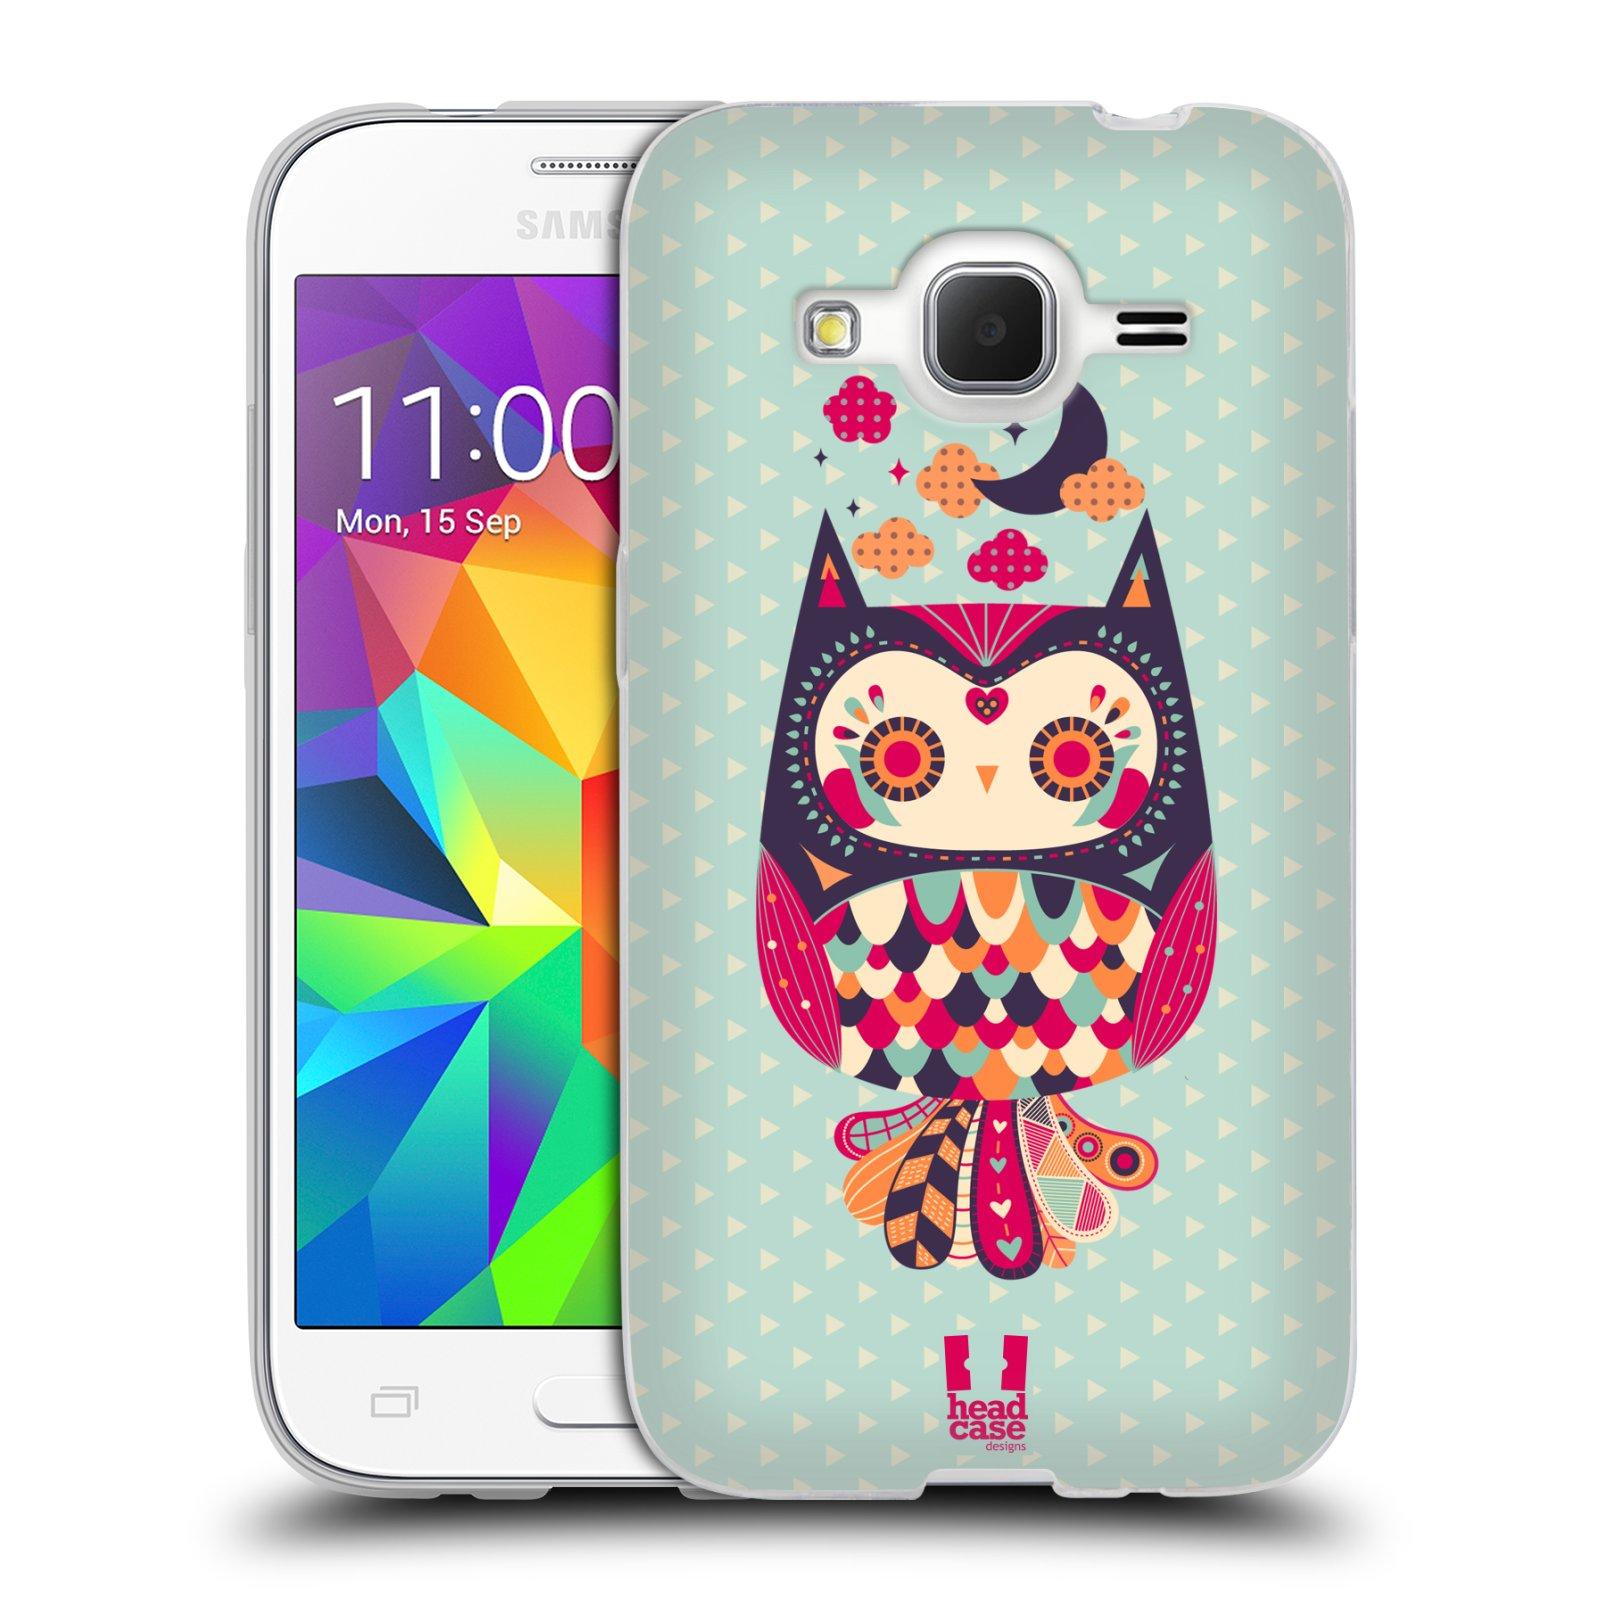 HEAD CASE silikonový obal na mobil Samsung Galaxy Core Prime (G360) vzor Stmívání sovička růžová a fialová